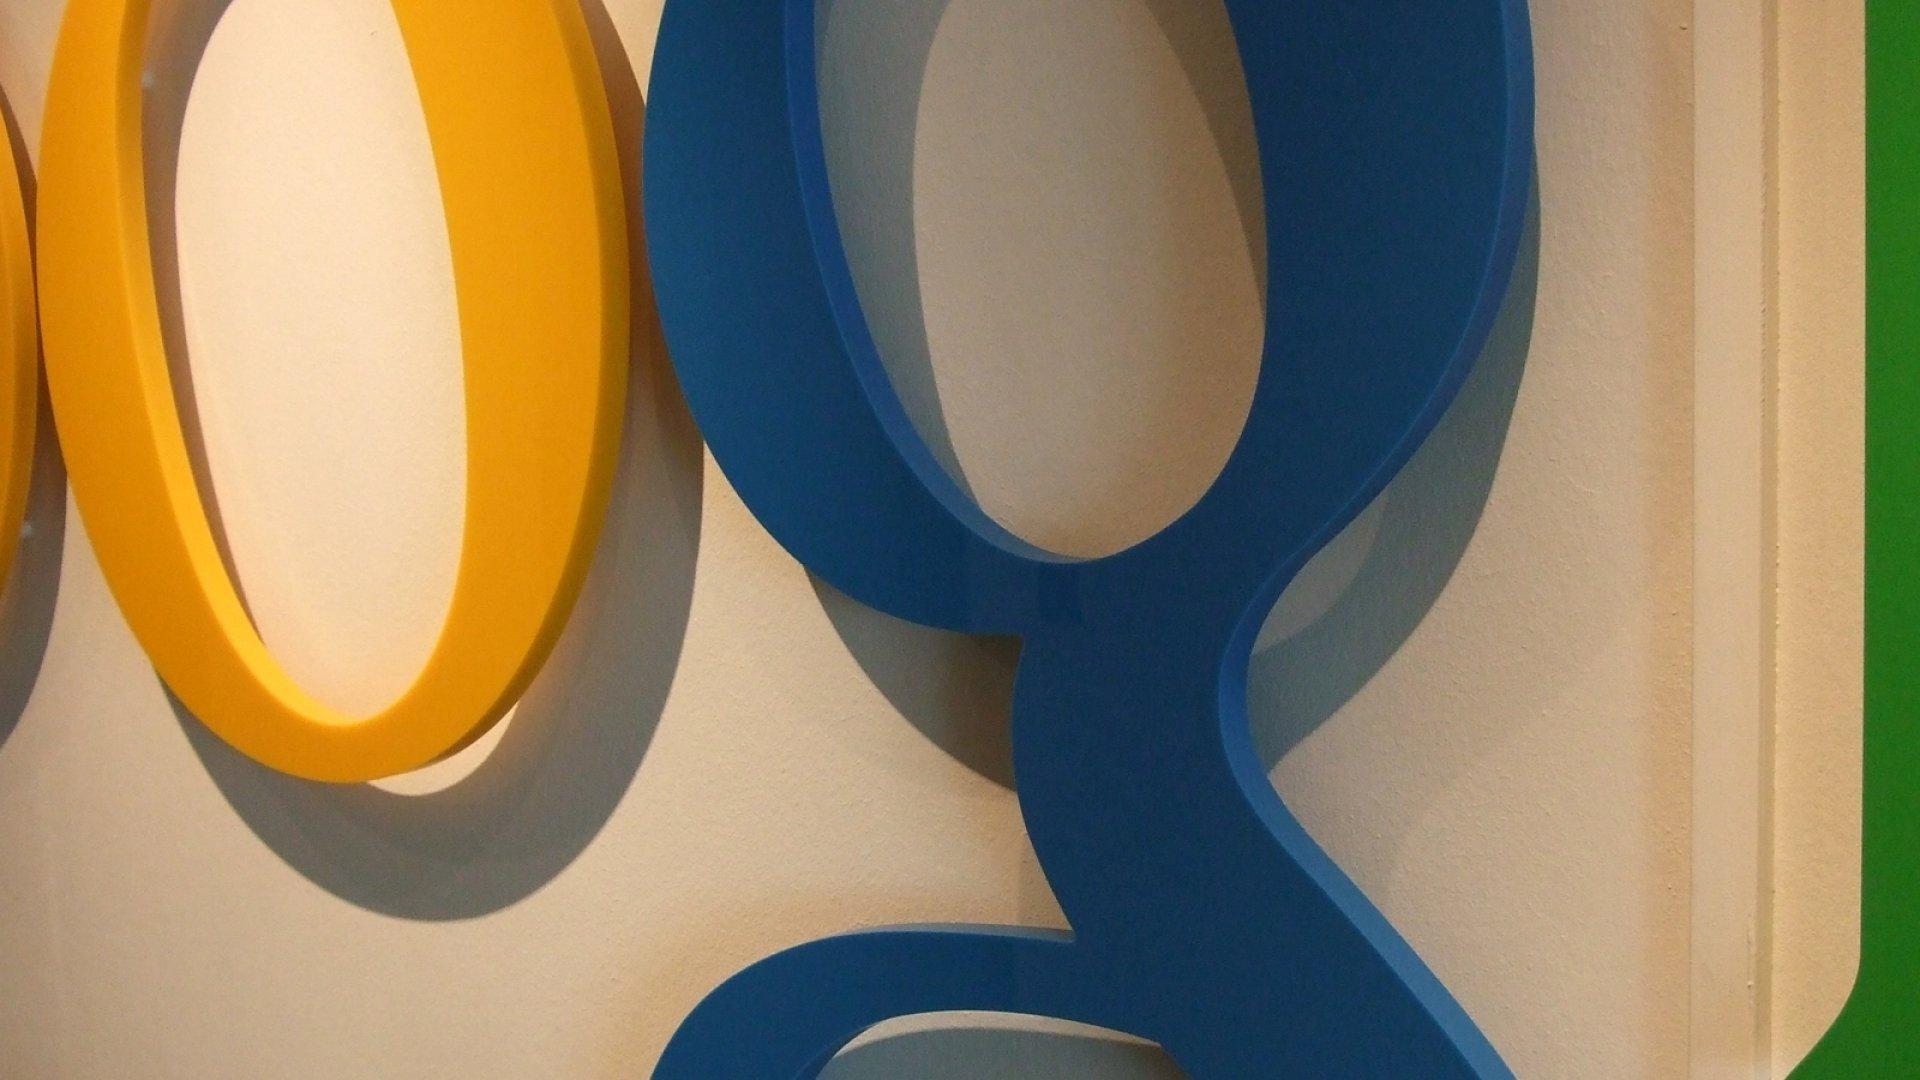 5 Startups Google Might Acquire Next